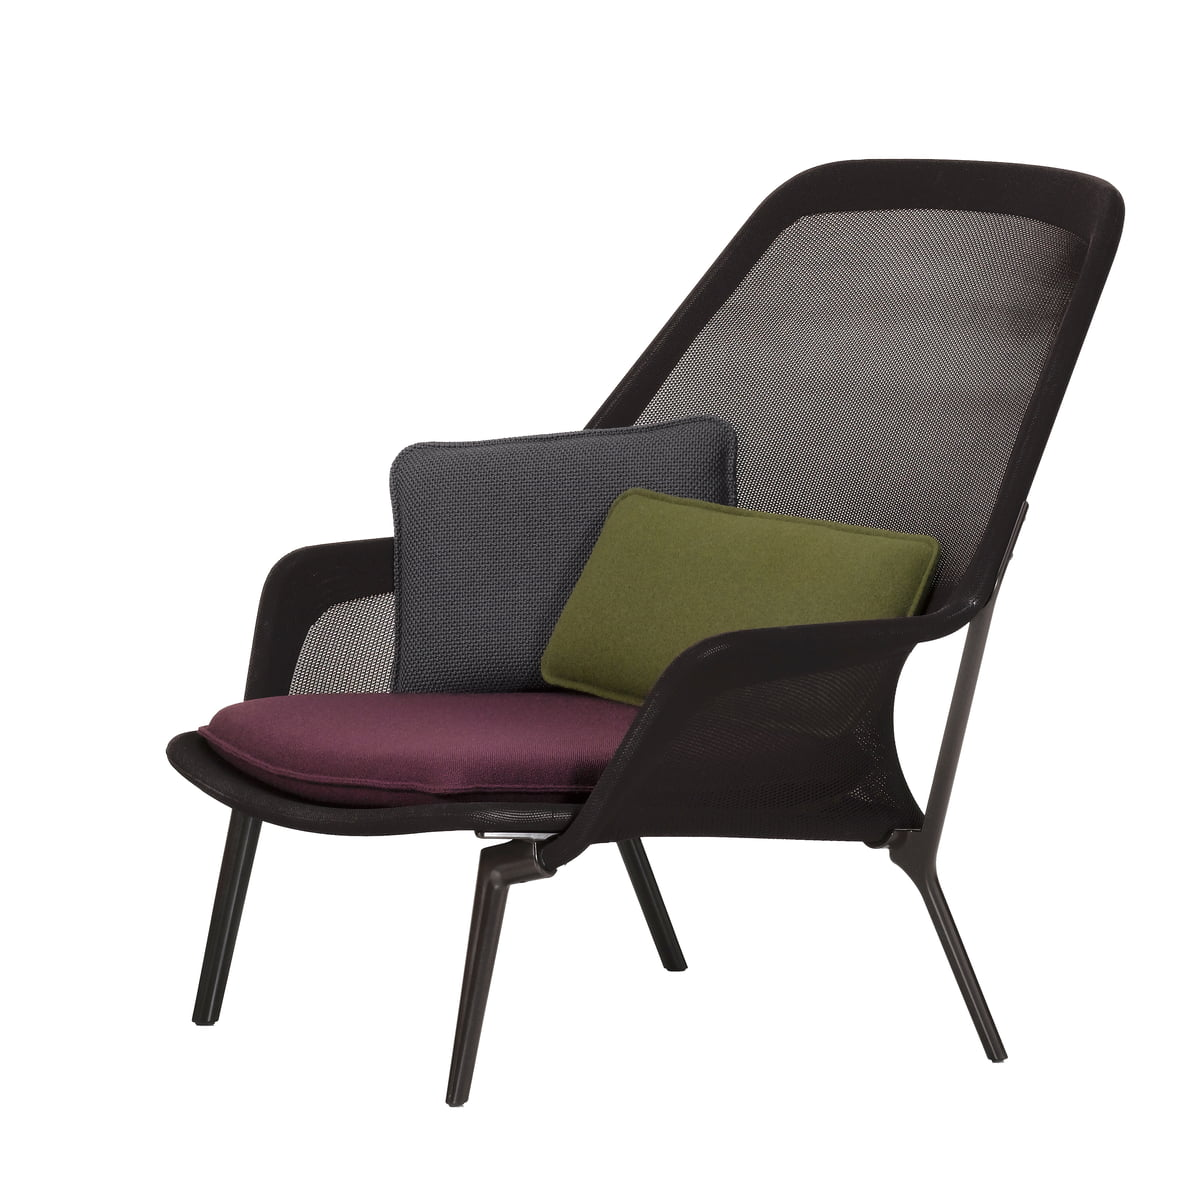 slow chair ottoman vitra shop. Black Bedroom Furniture Sets. Home Design Ideas